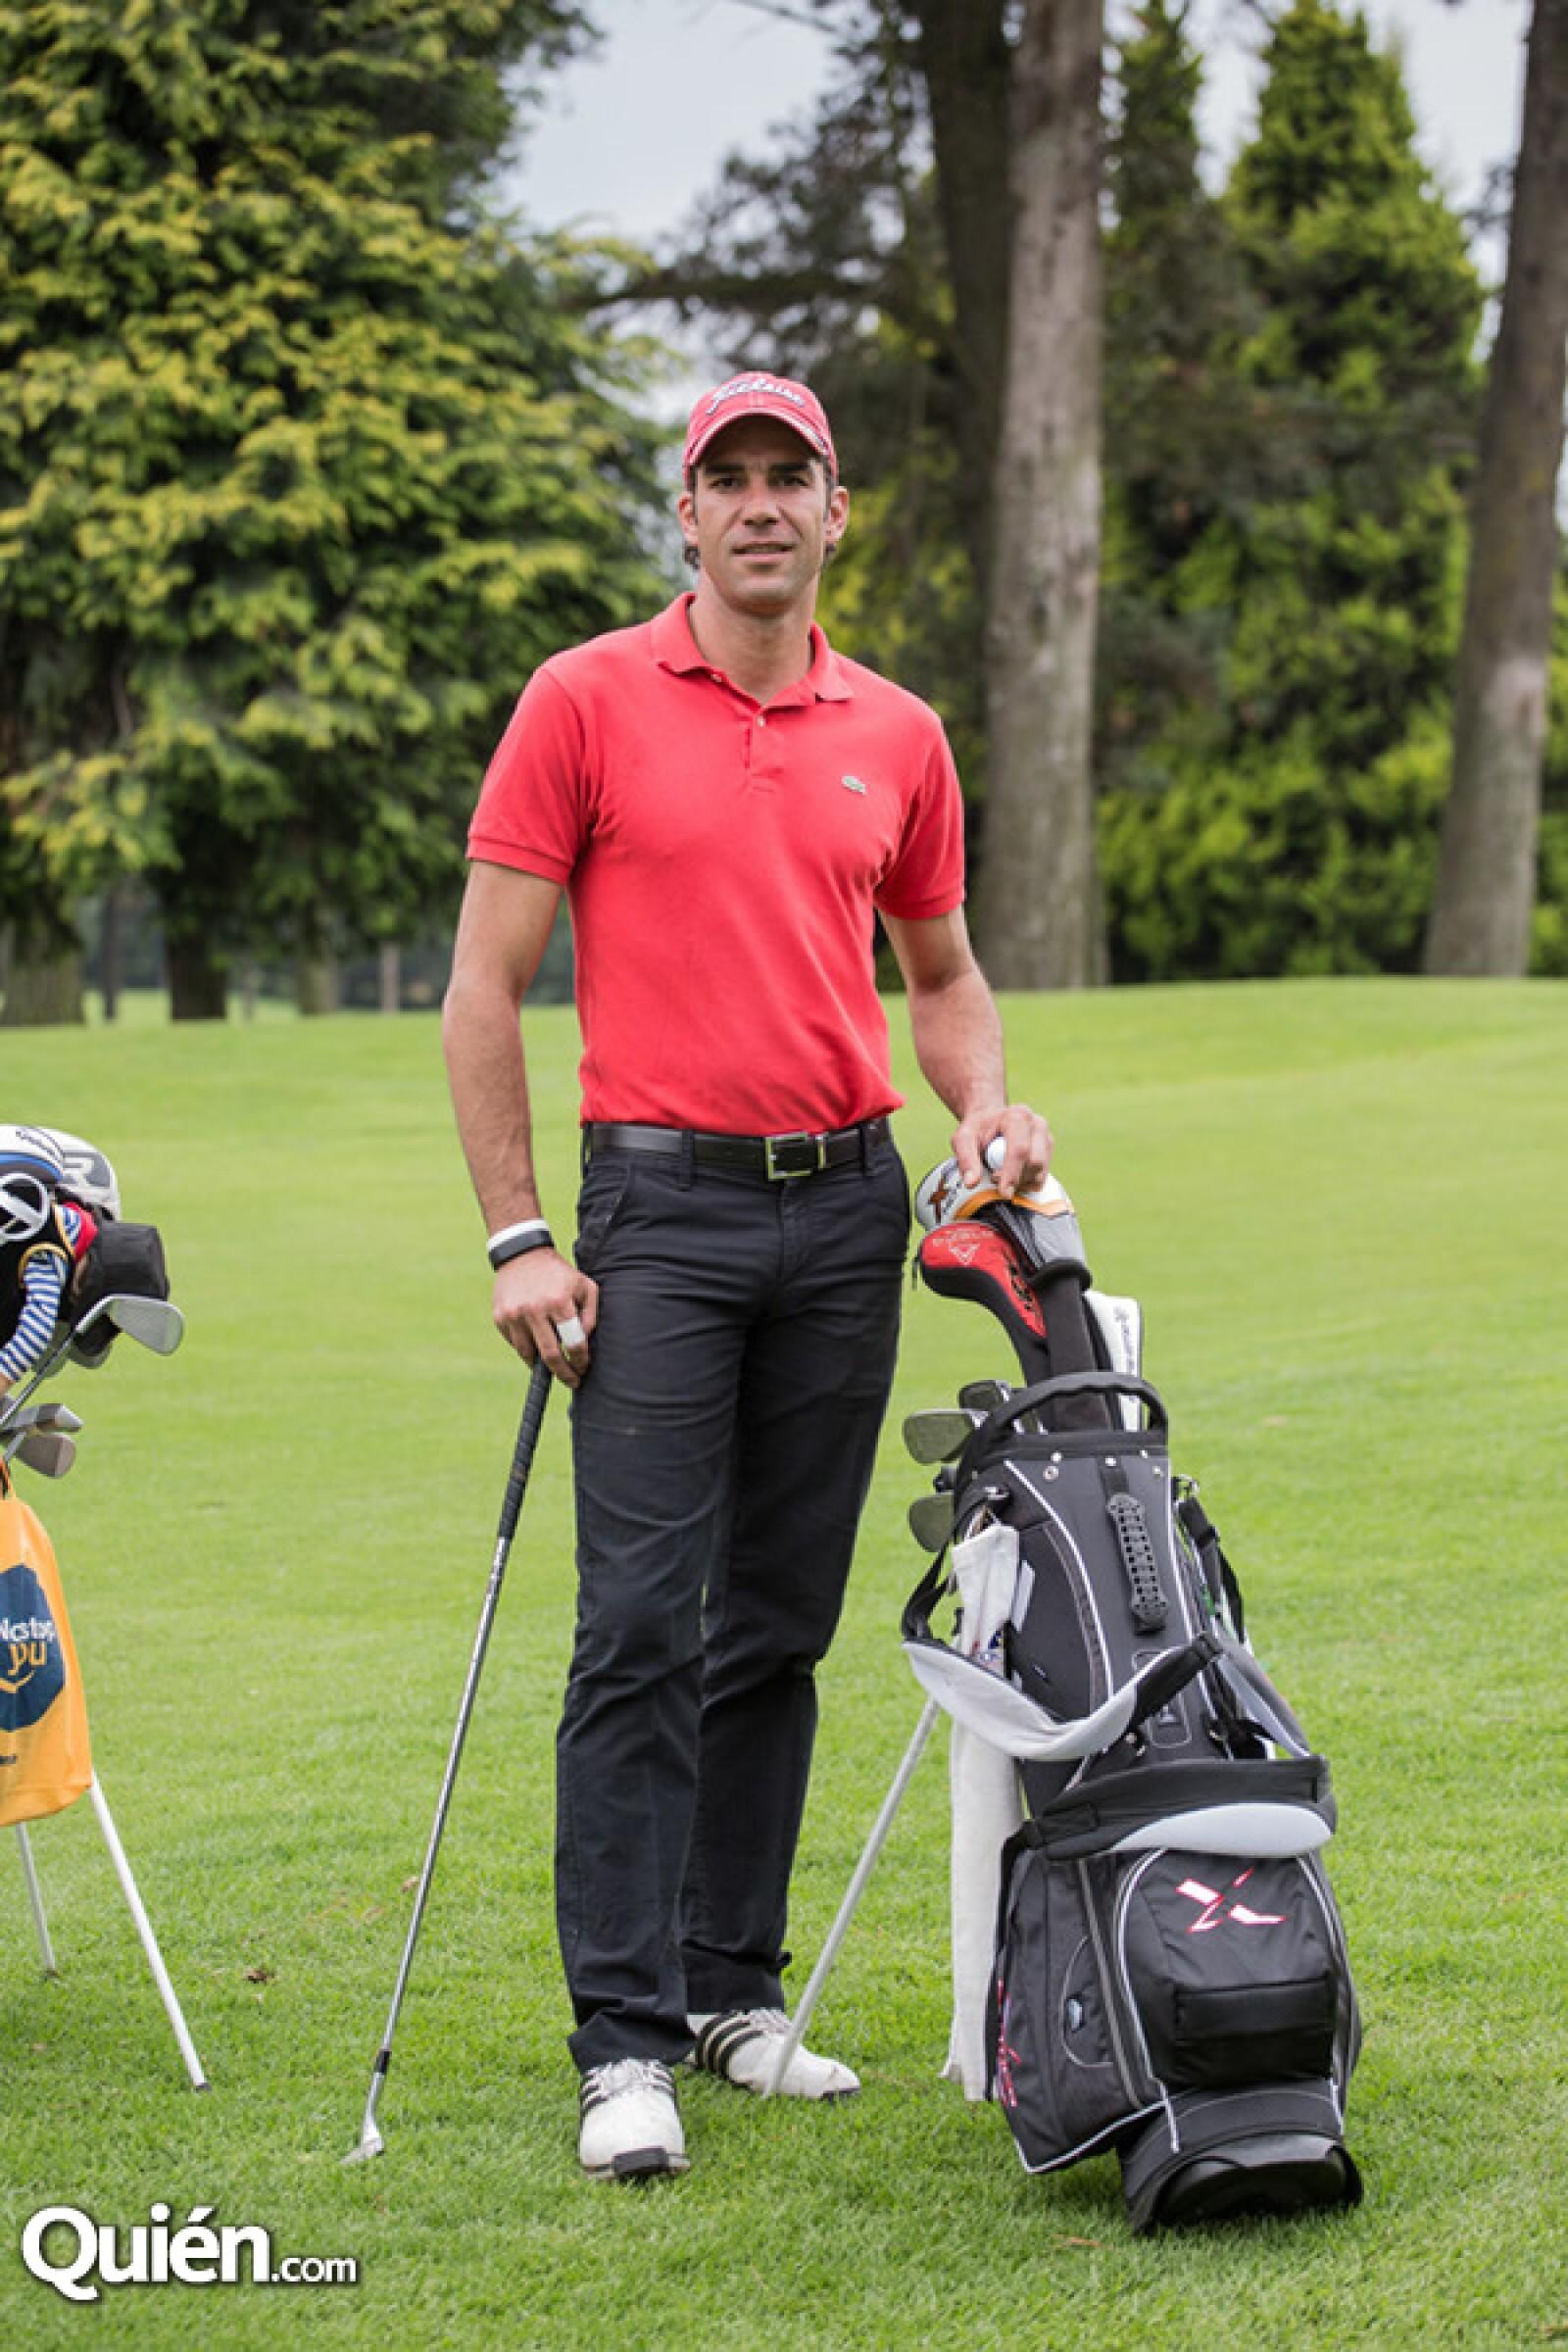 Luis Felipe Mata